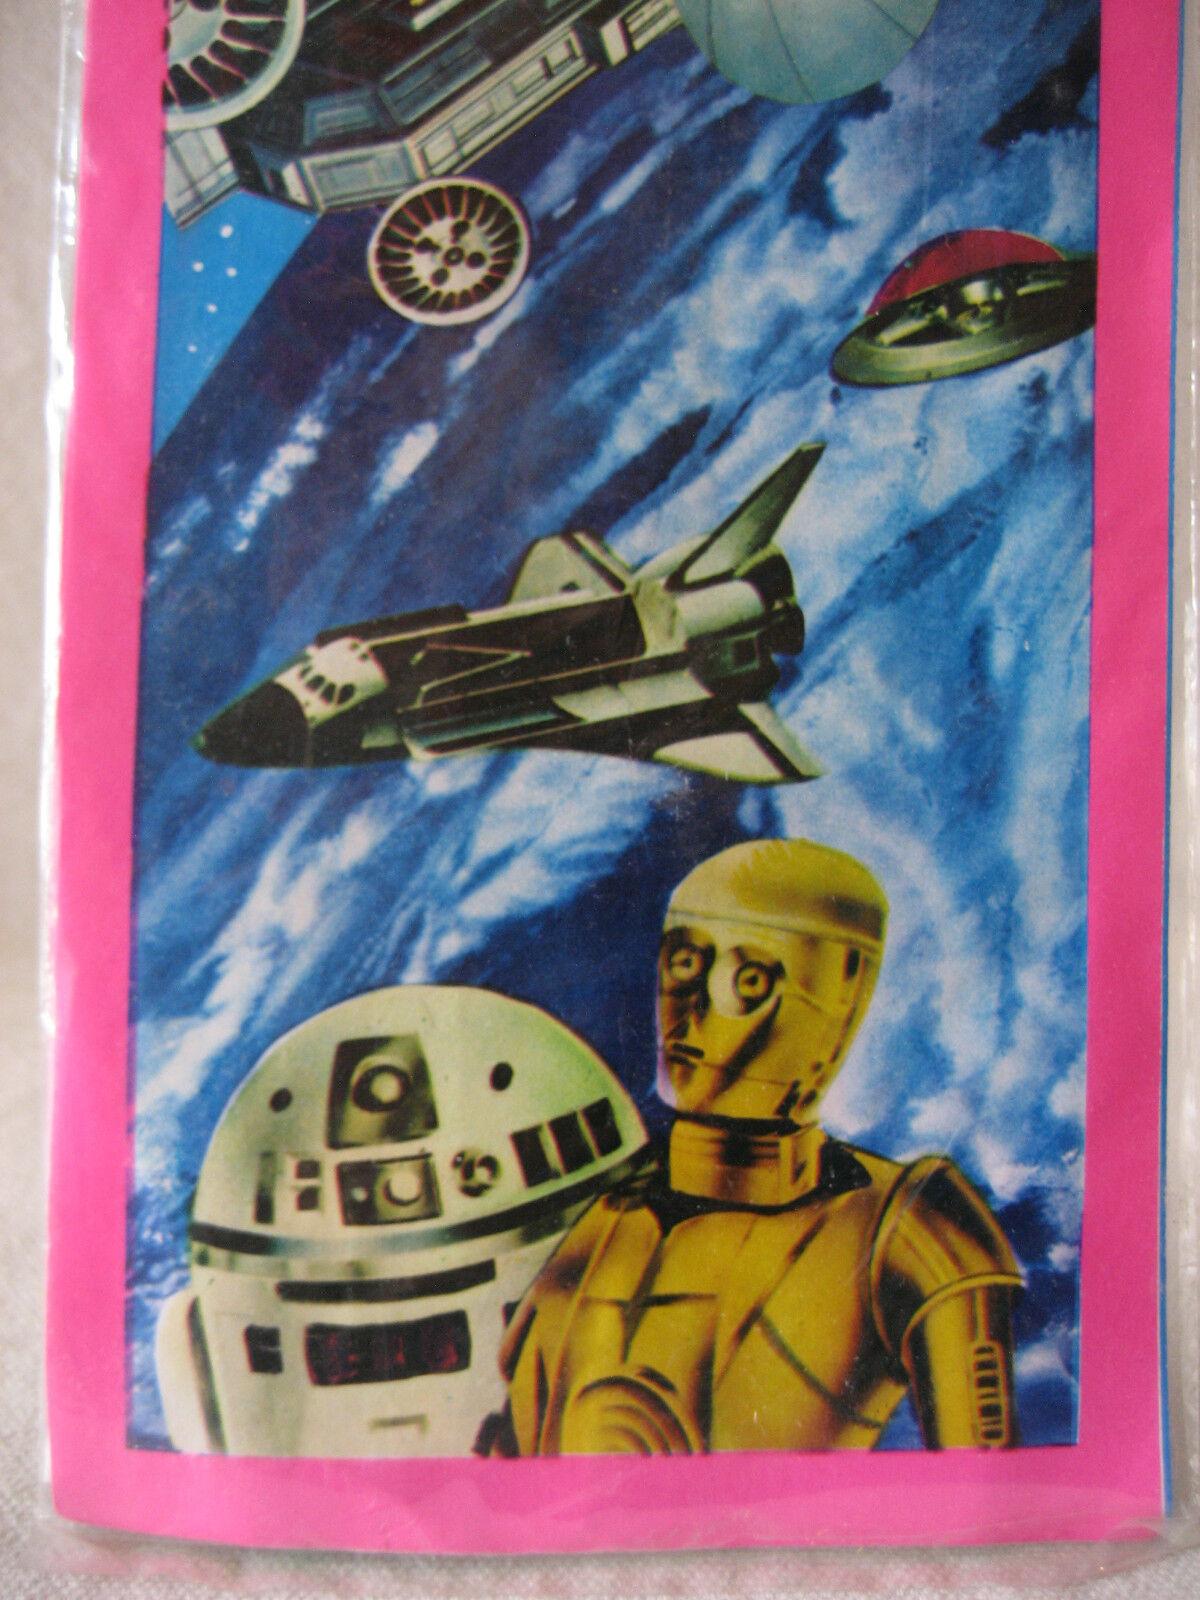 Vintage Japanese R2-D2 C-3PO Lupin III UFO kite kite kite Japan Star Wars space shuttle    c25e31